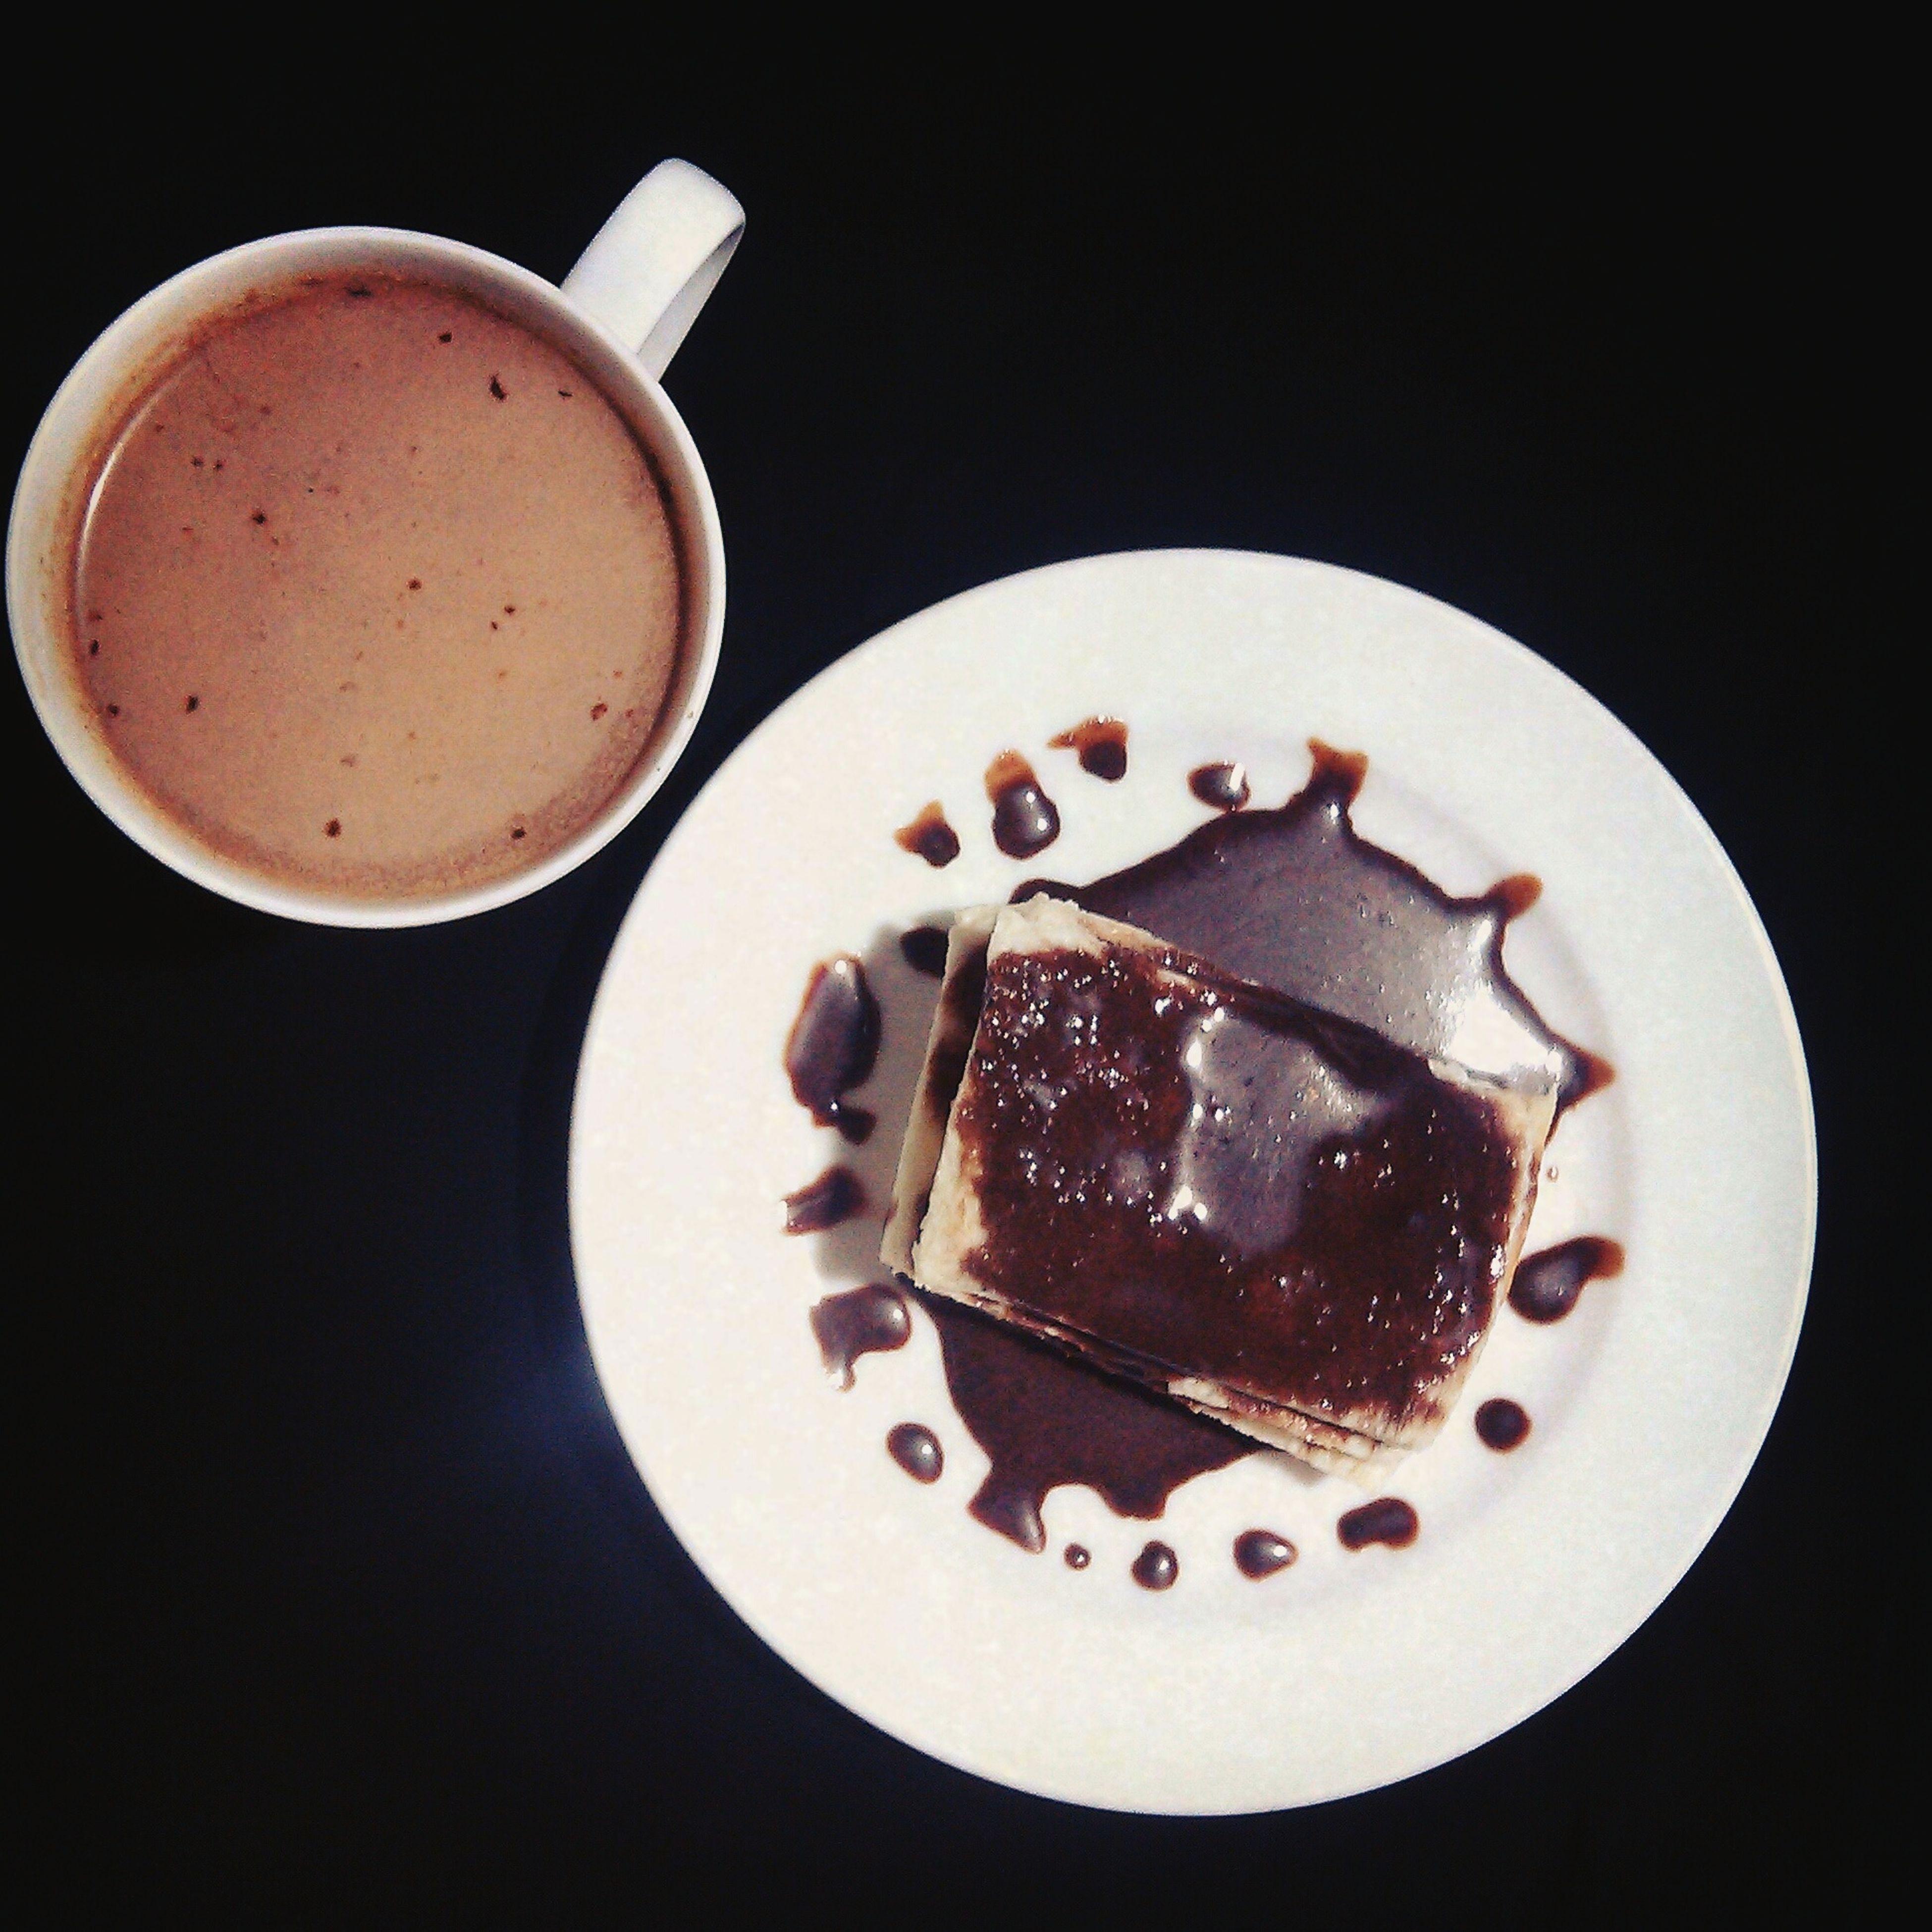 Sweetheaven Chocoholic Notphotogenicfood Coffee Ideaofasnack Notperfect Stillgoodtho